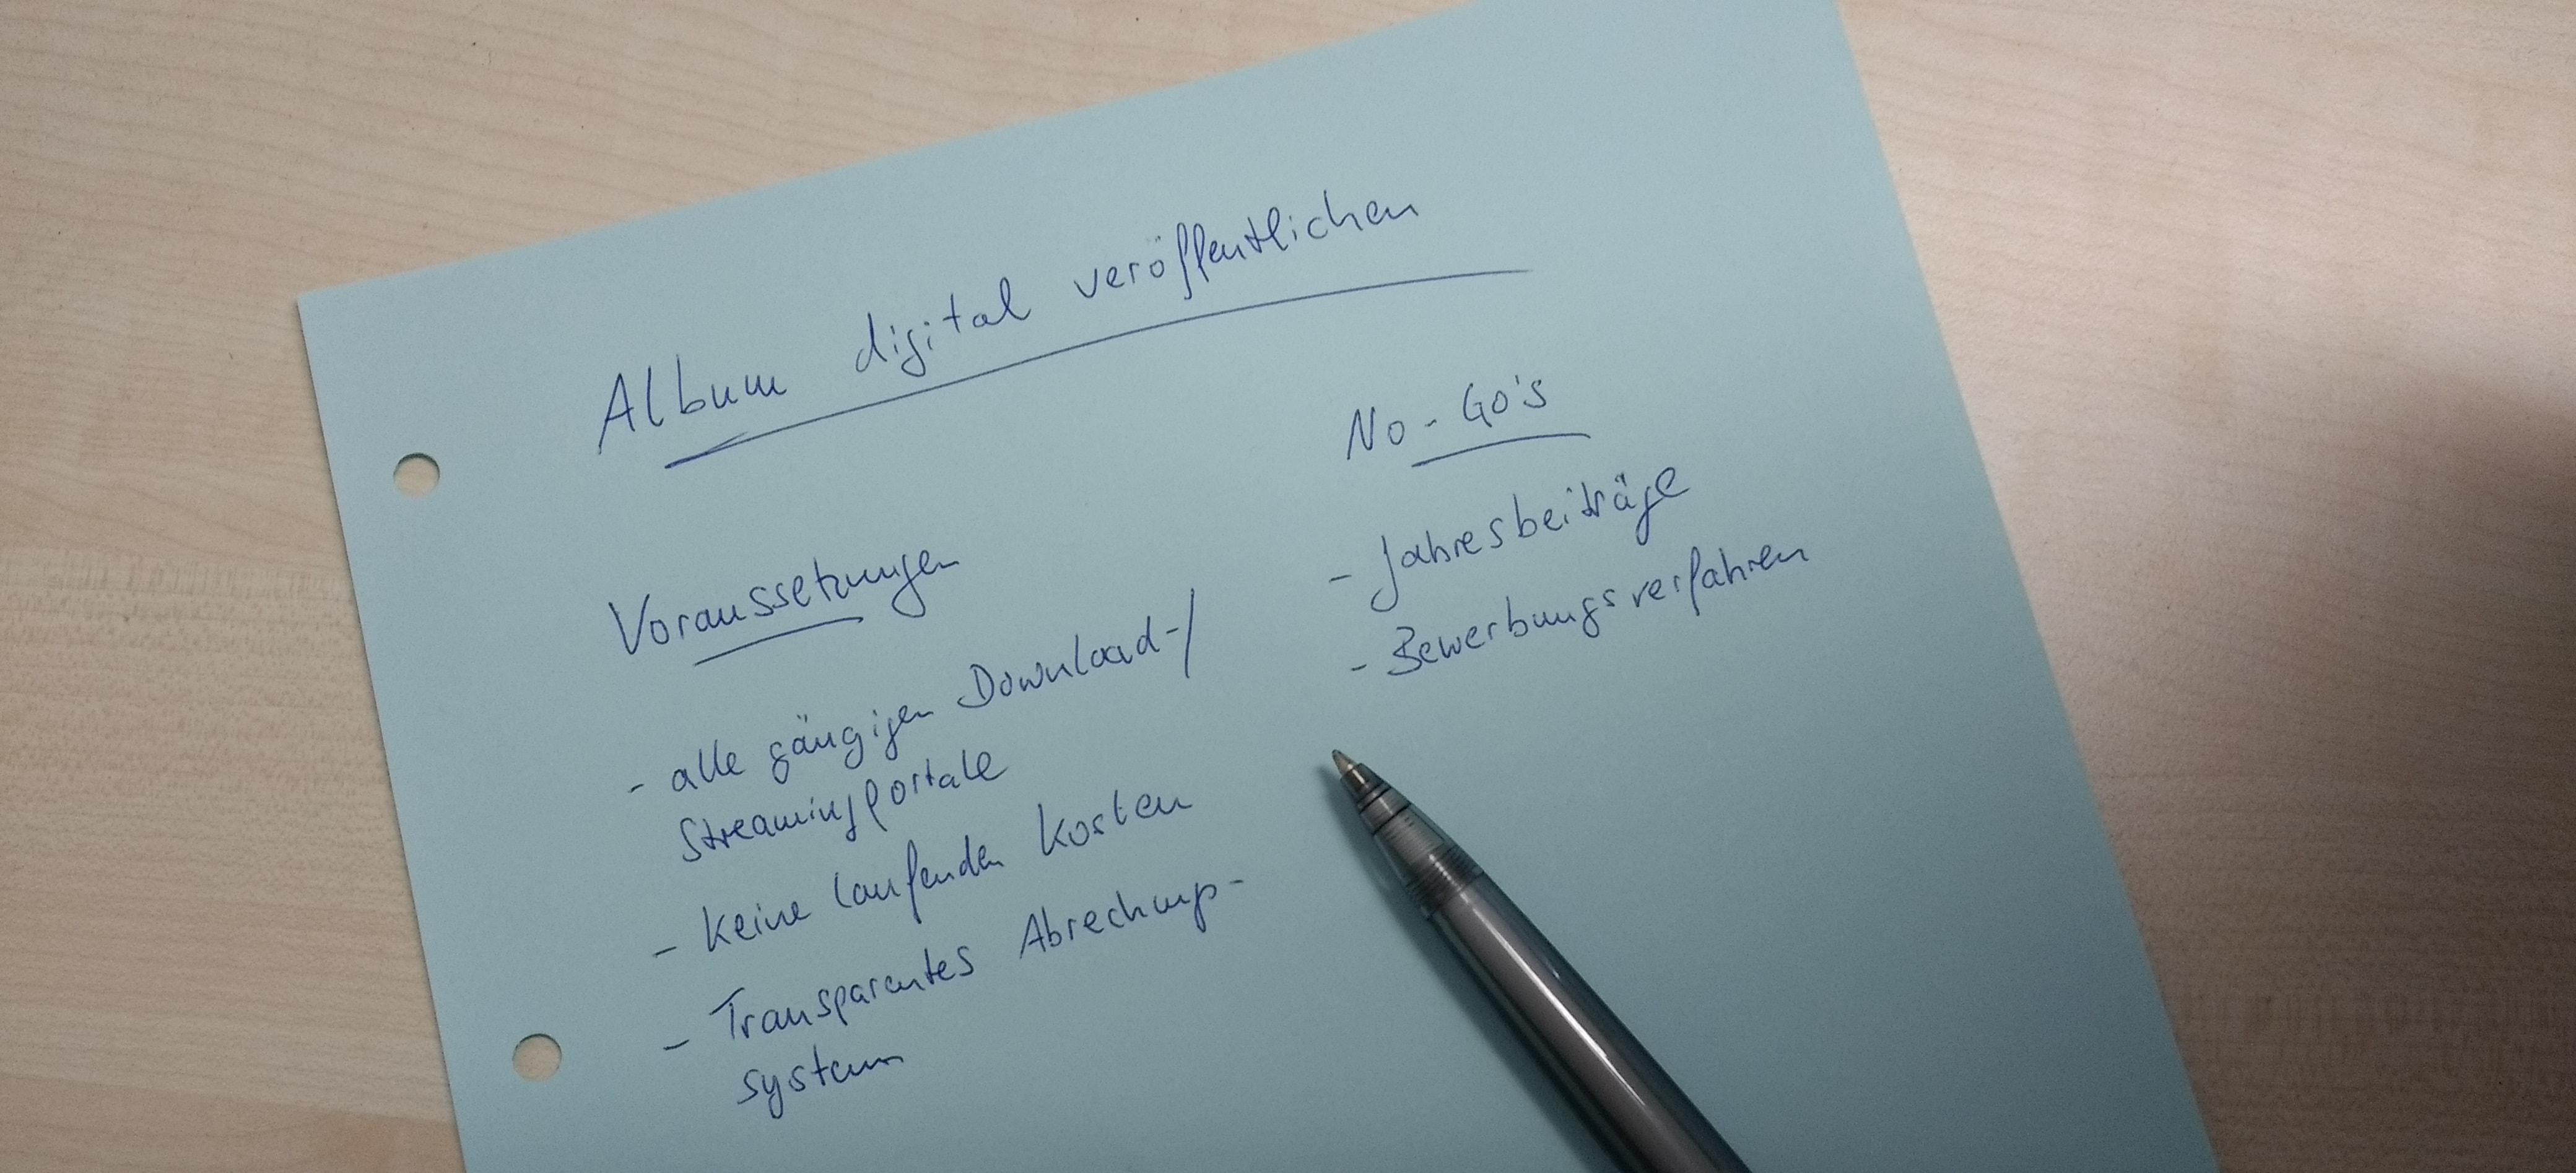 Das_nervt_11-2017_Digitaler-Vertrieb-min